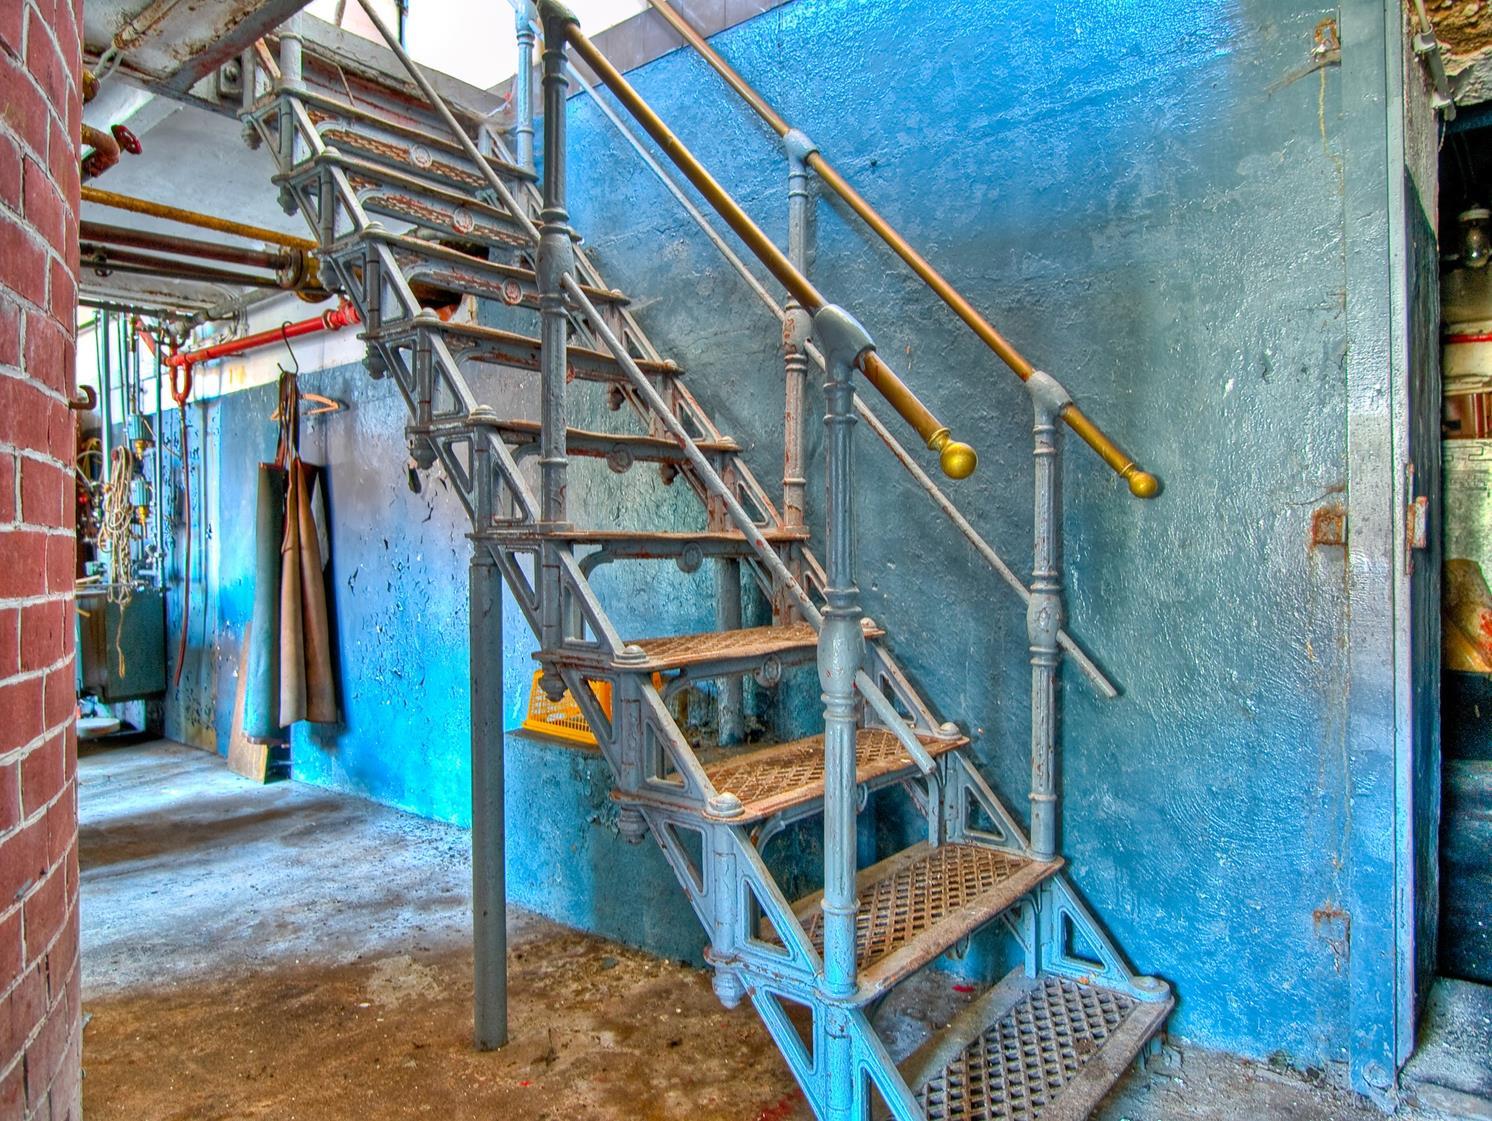 P9150978_6_7_tonemapped-Gusstreppe-vor-blauer-Wand-sRGB300dpi (Copy)